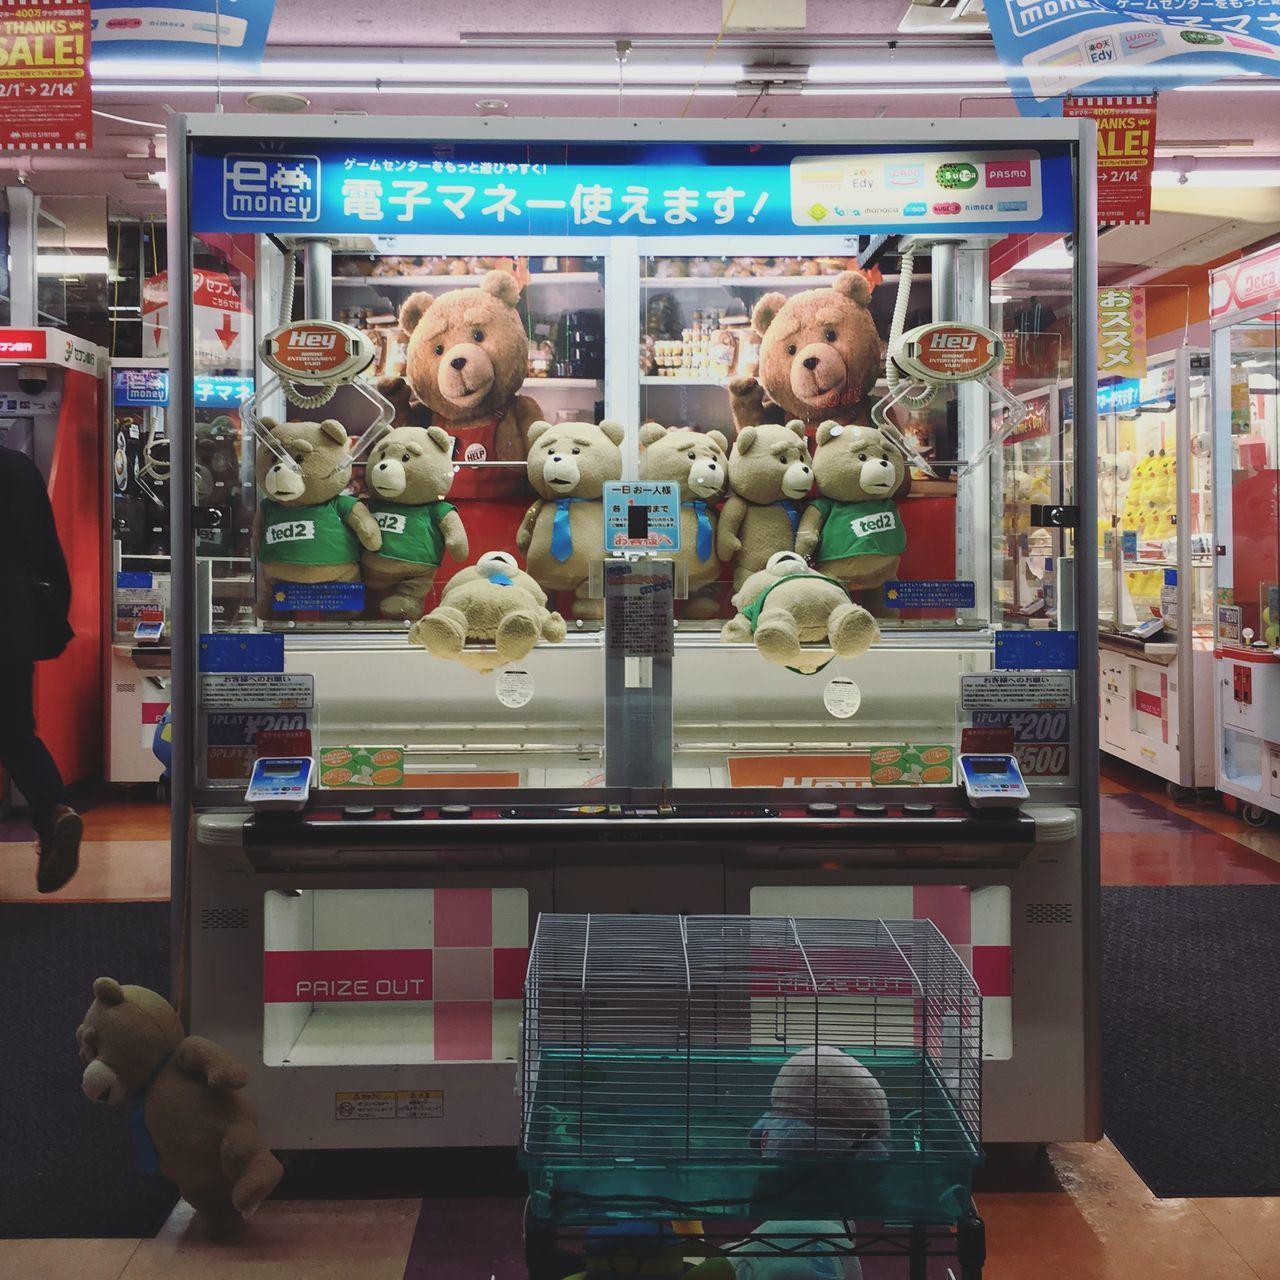 Tokyo Ted Game Machine Japan Dolls